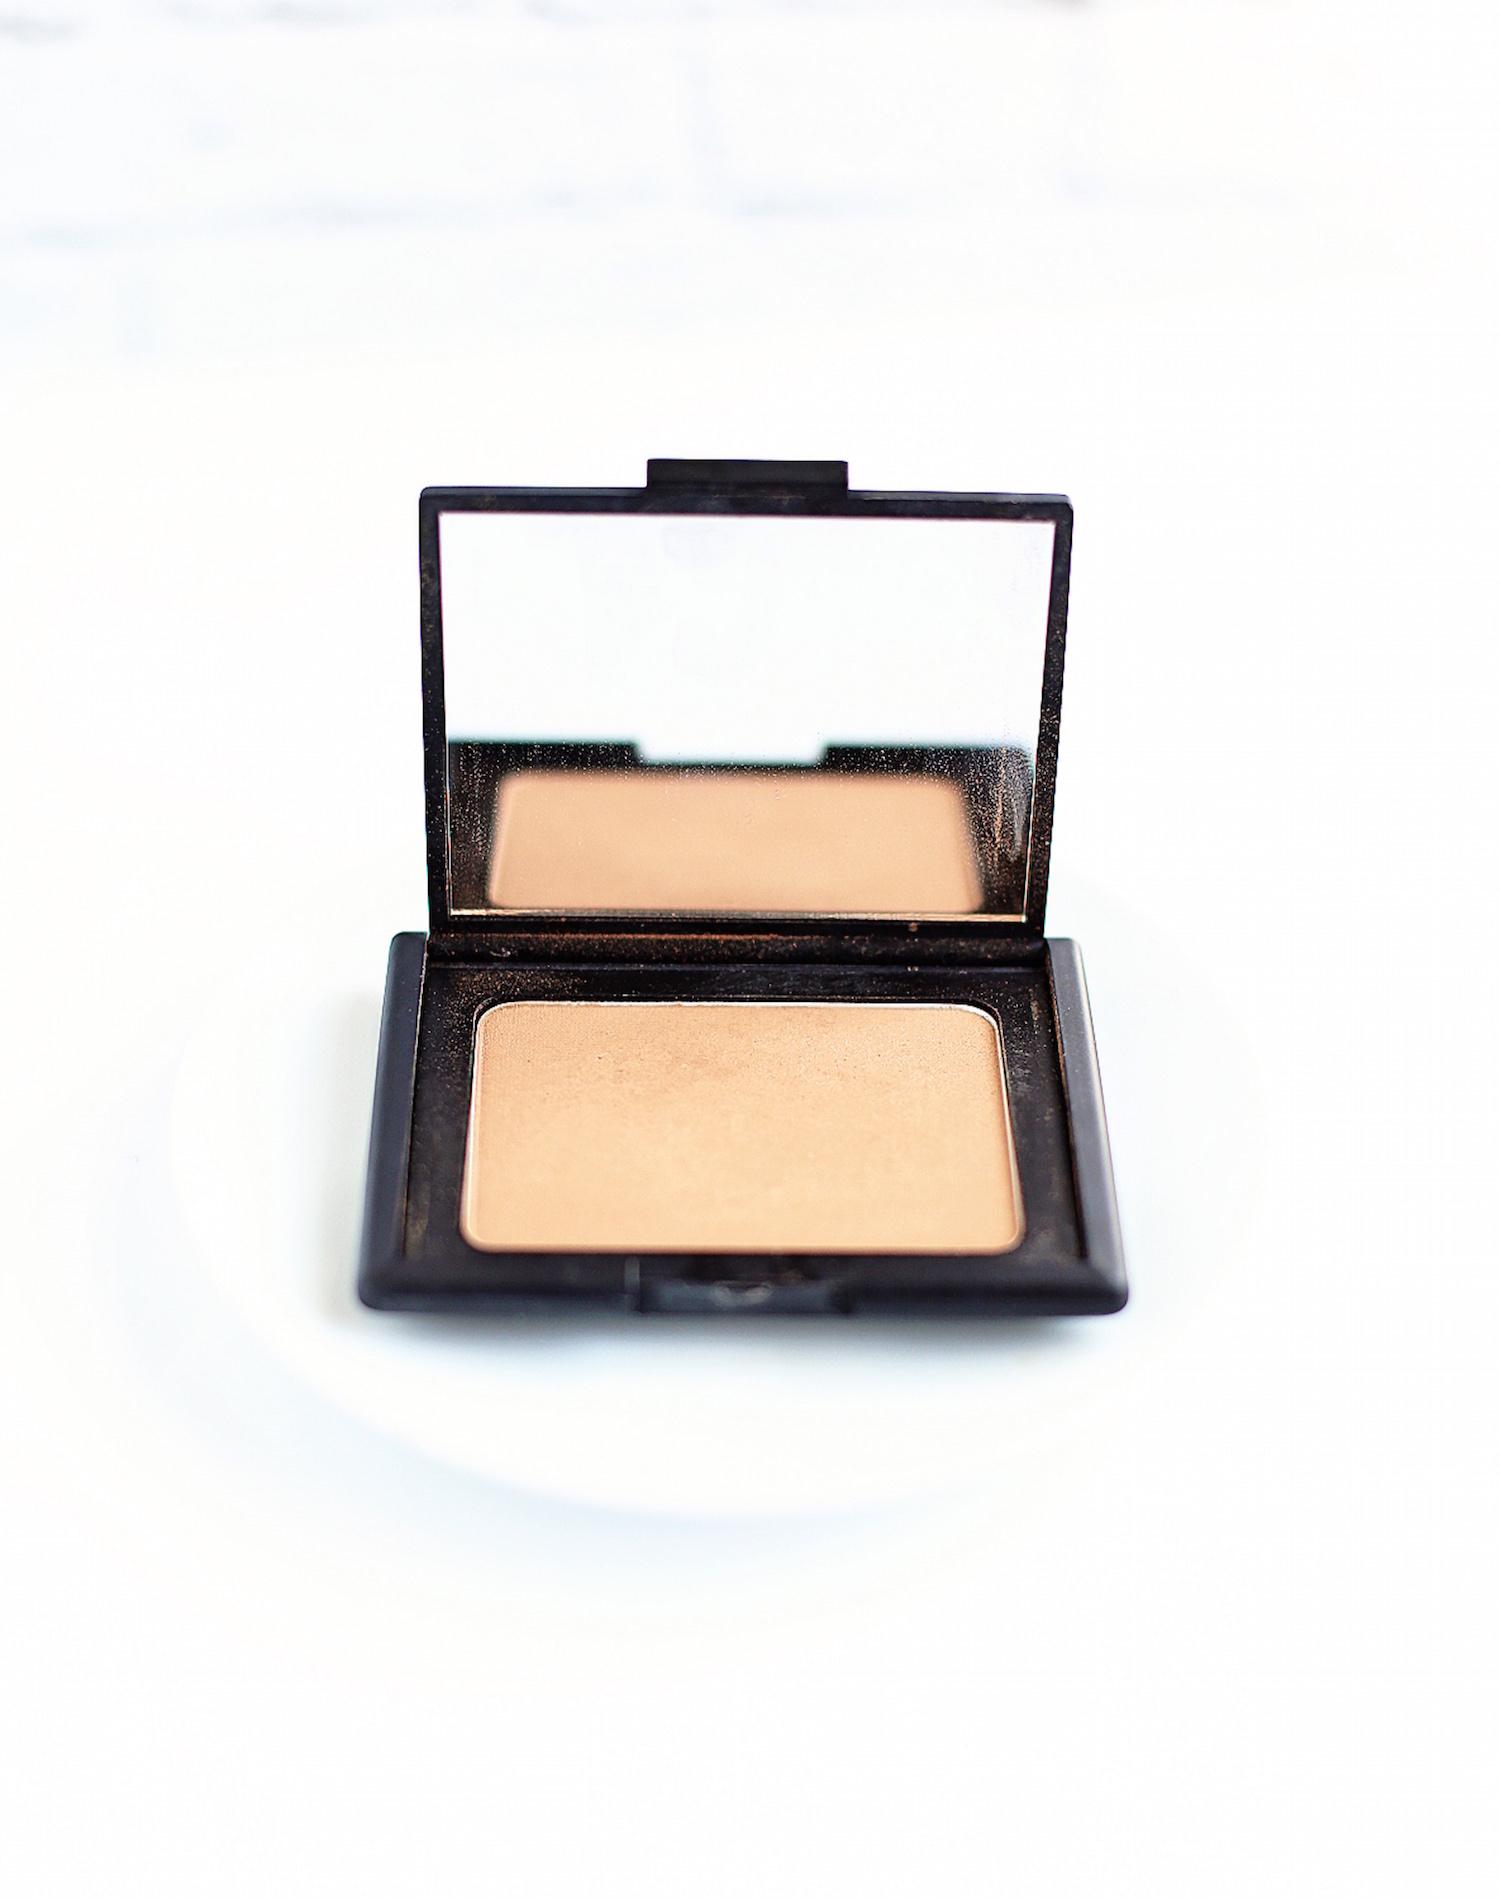 My 10 New Favorite Beauty Products - Nars Bronzer | TrufflesandTrends.com